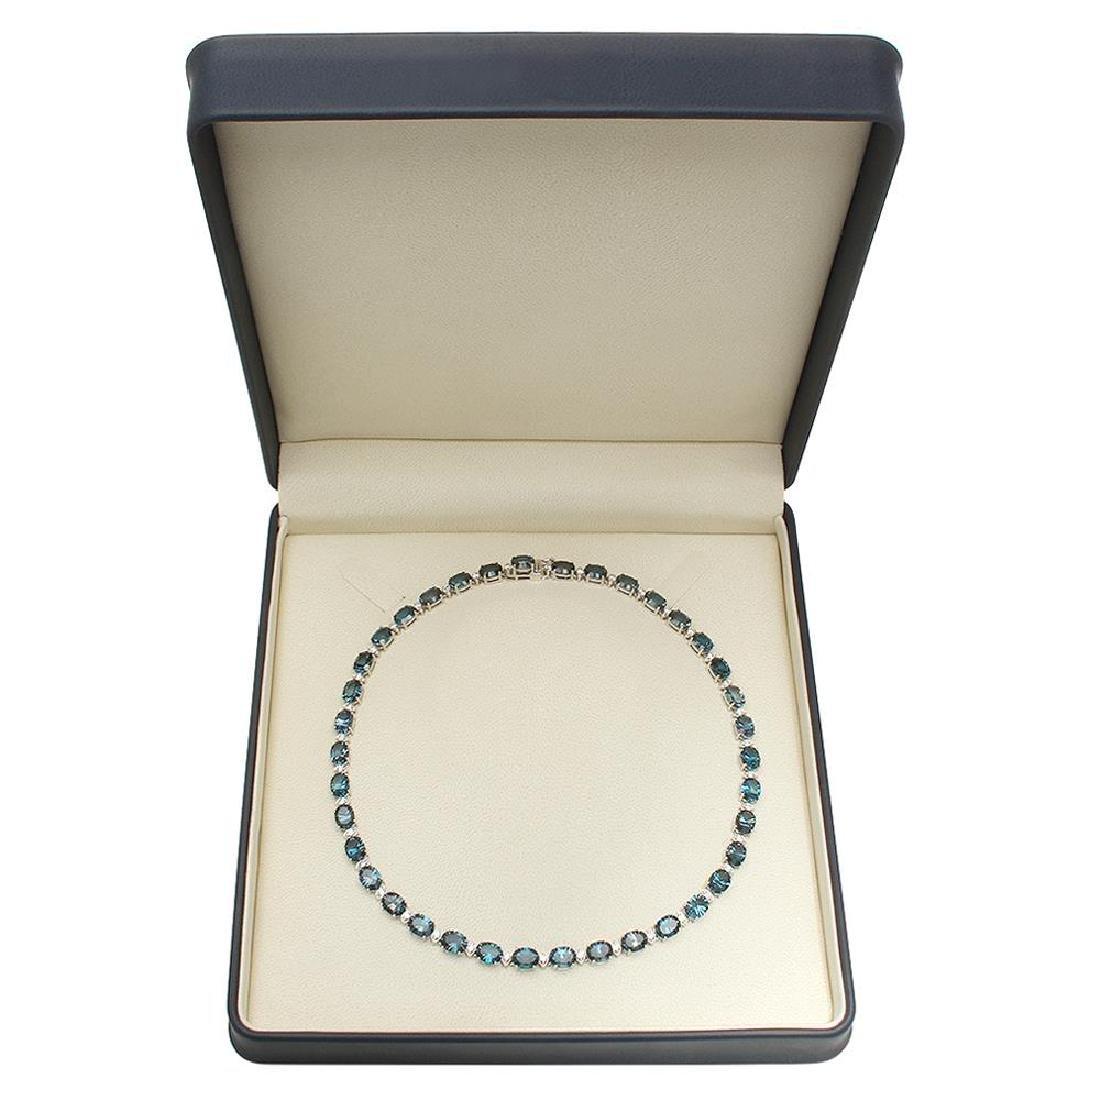 14K Gold 56.38ct Topaz 2.73ct Diamond Necklace - 4